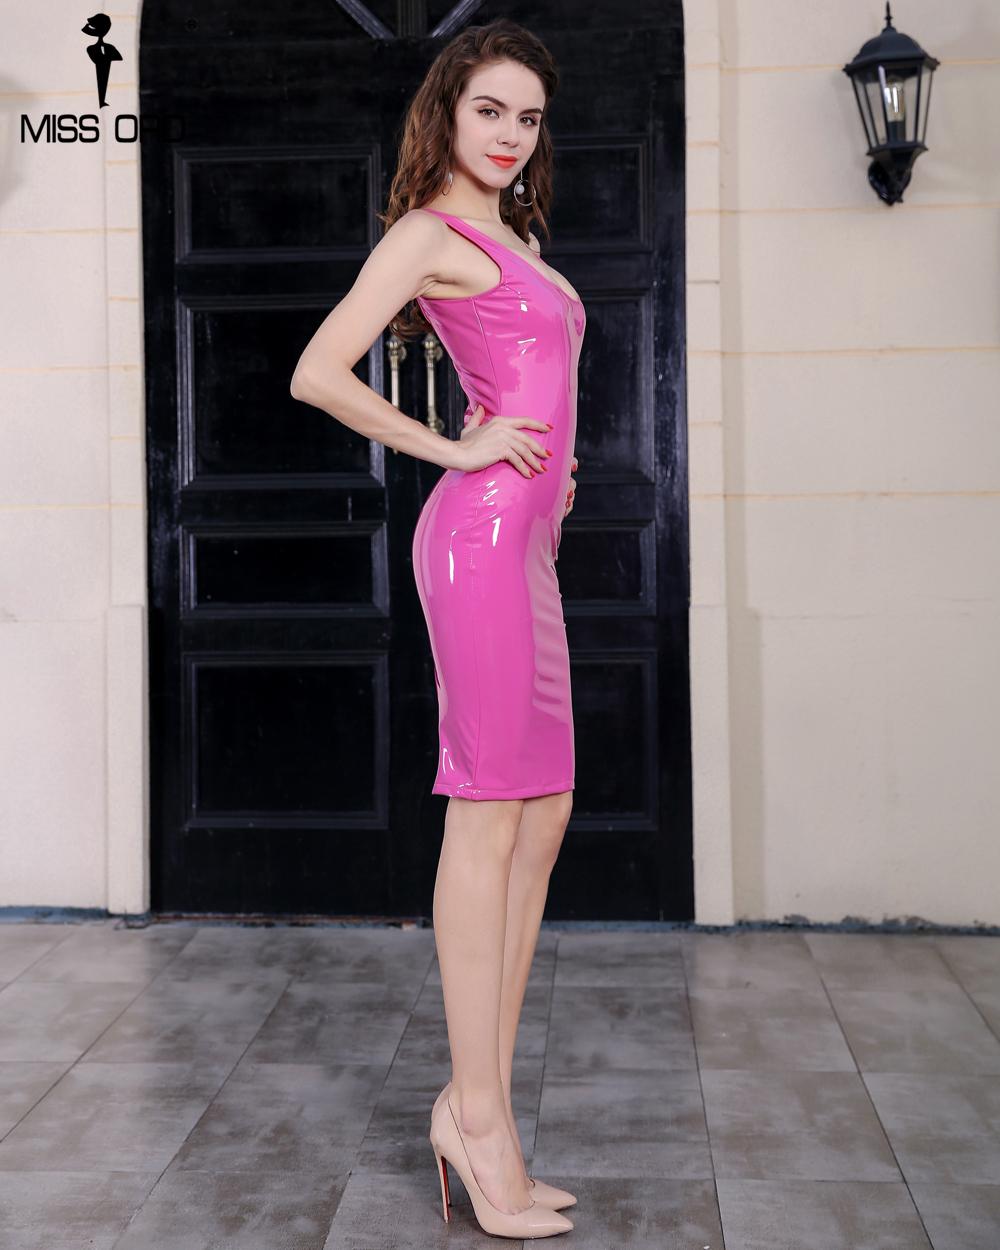 Neon Pink Vinyl Tight Dress Sissy Dream